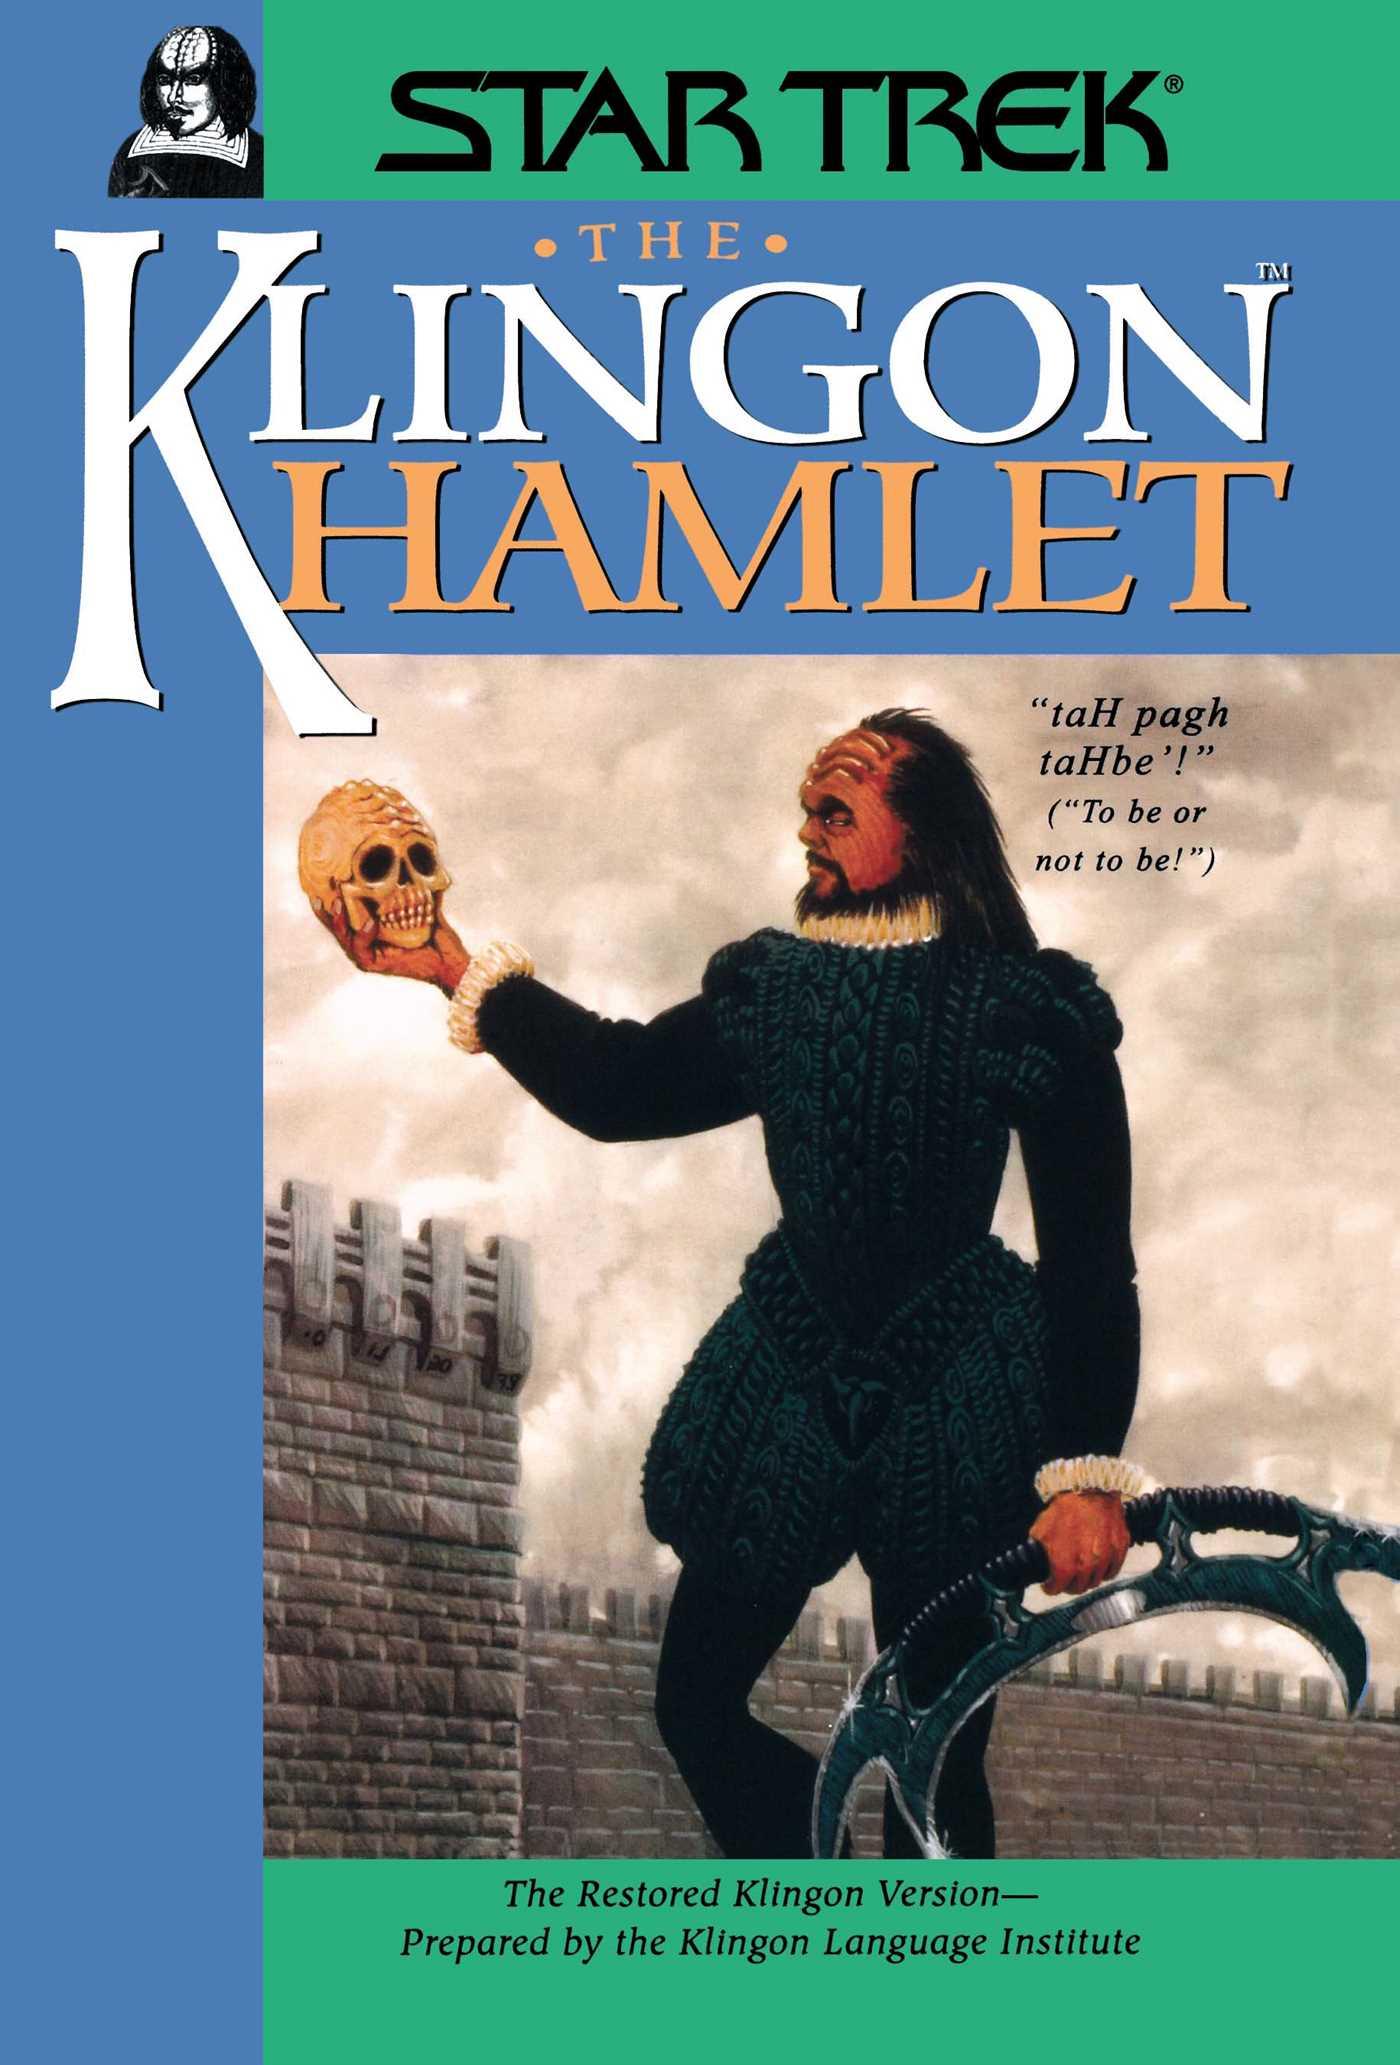 The klingon hamlet 9780671035785 hr